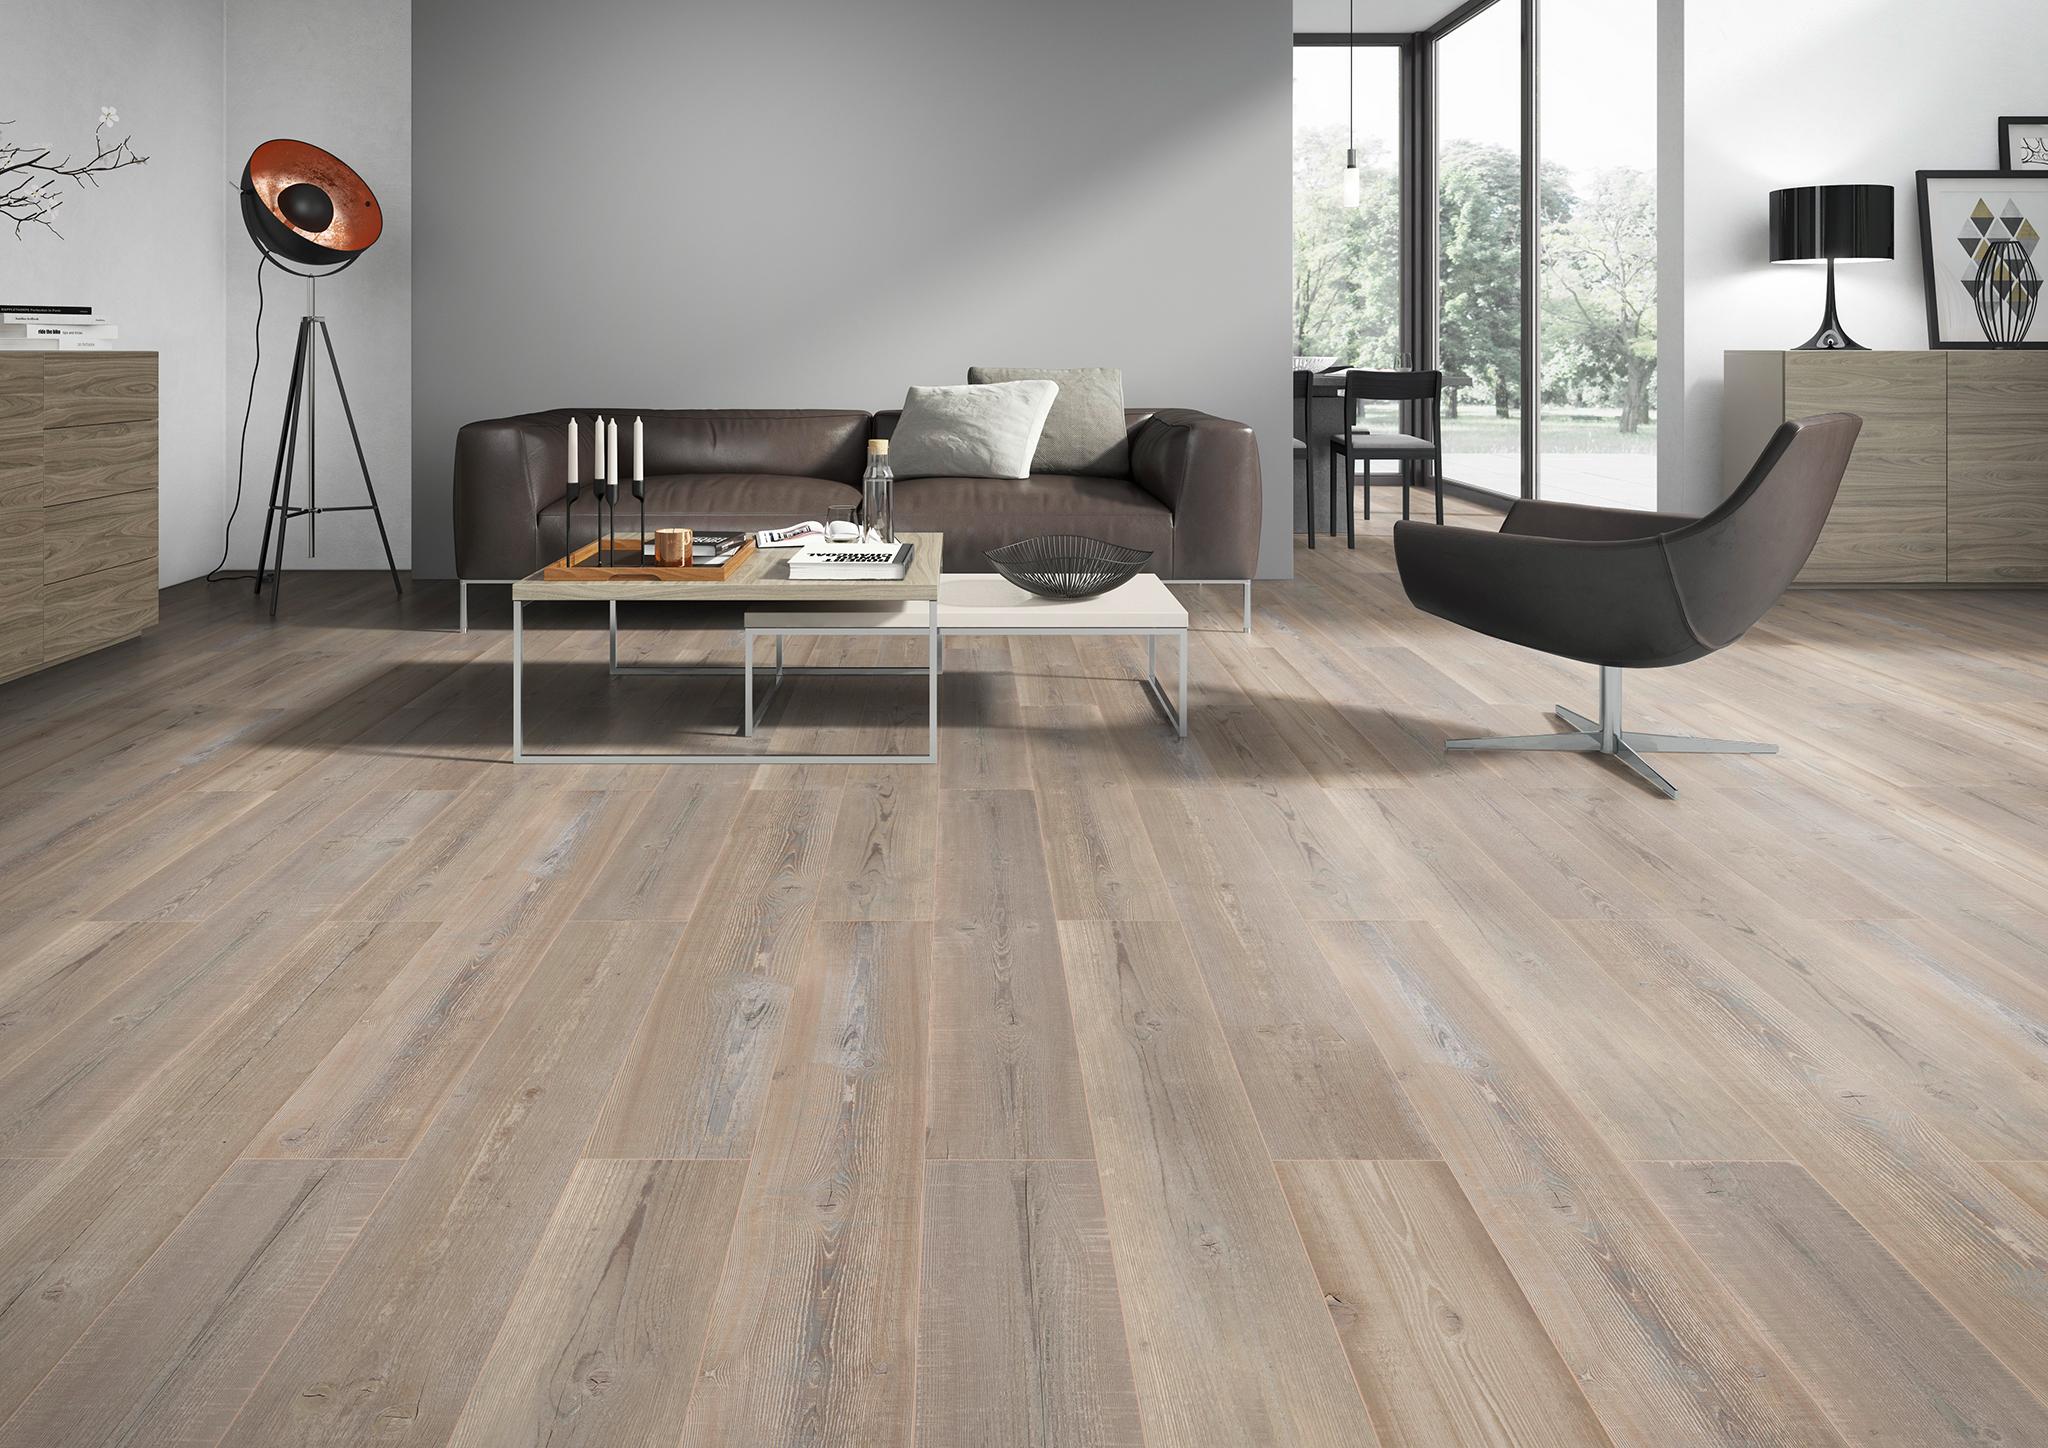 Design floor Sono Pro Forest Scandic Ash